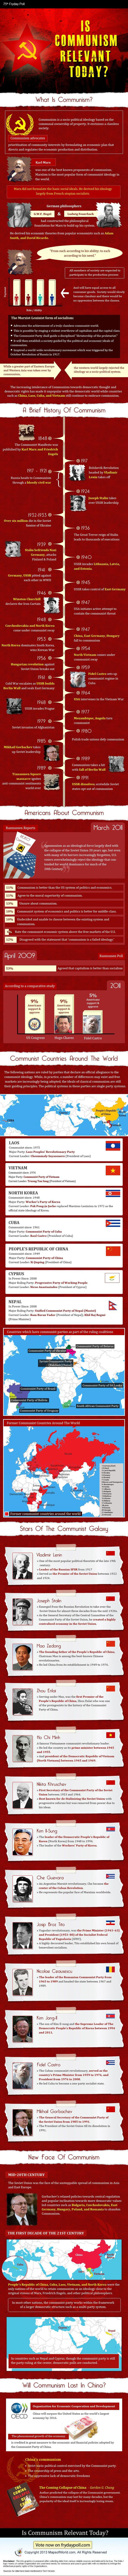 Communism Infographic